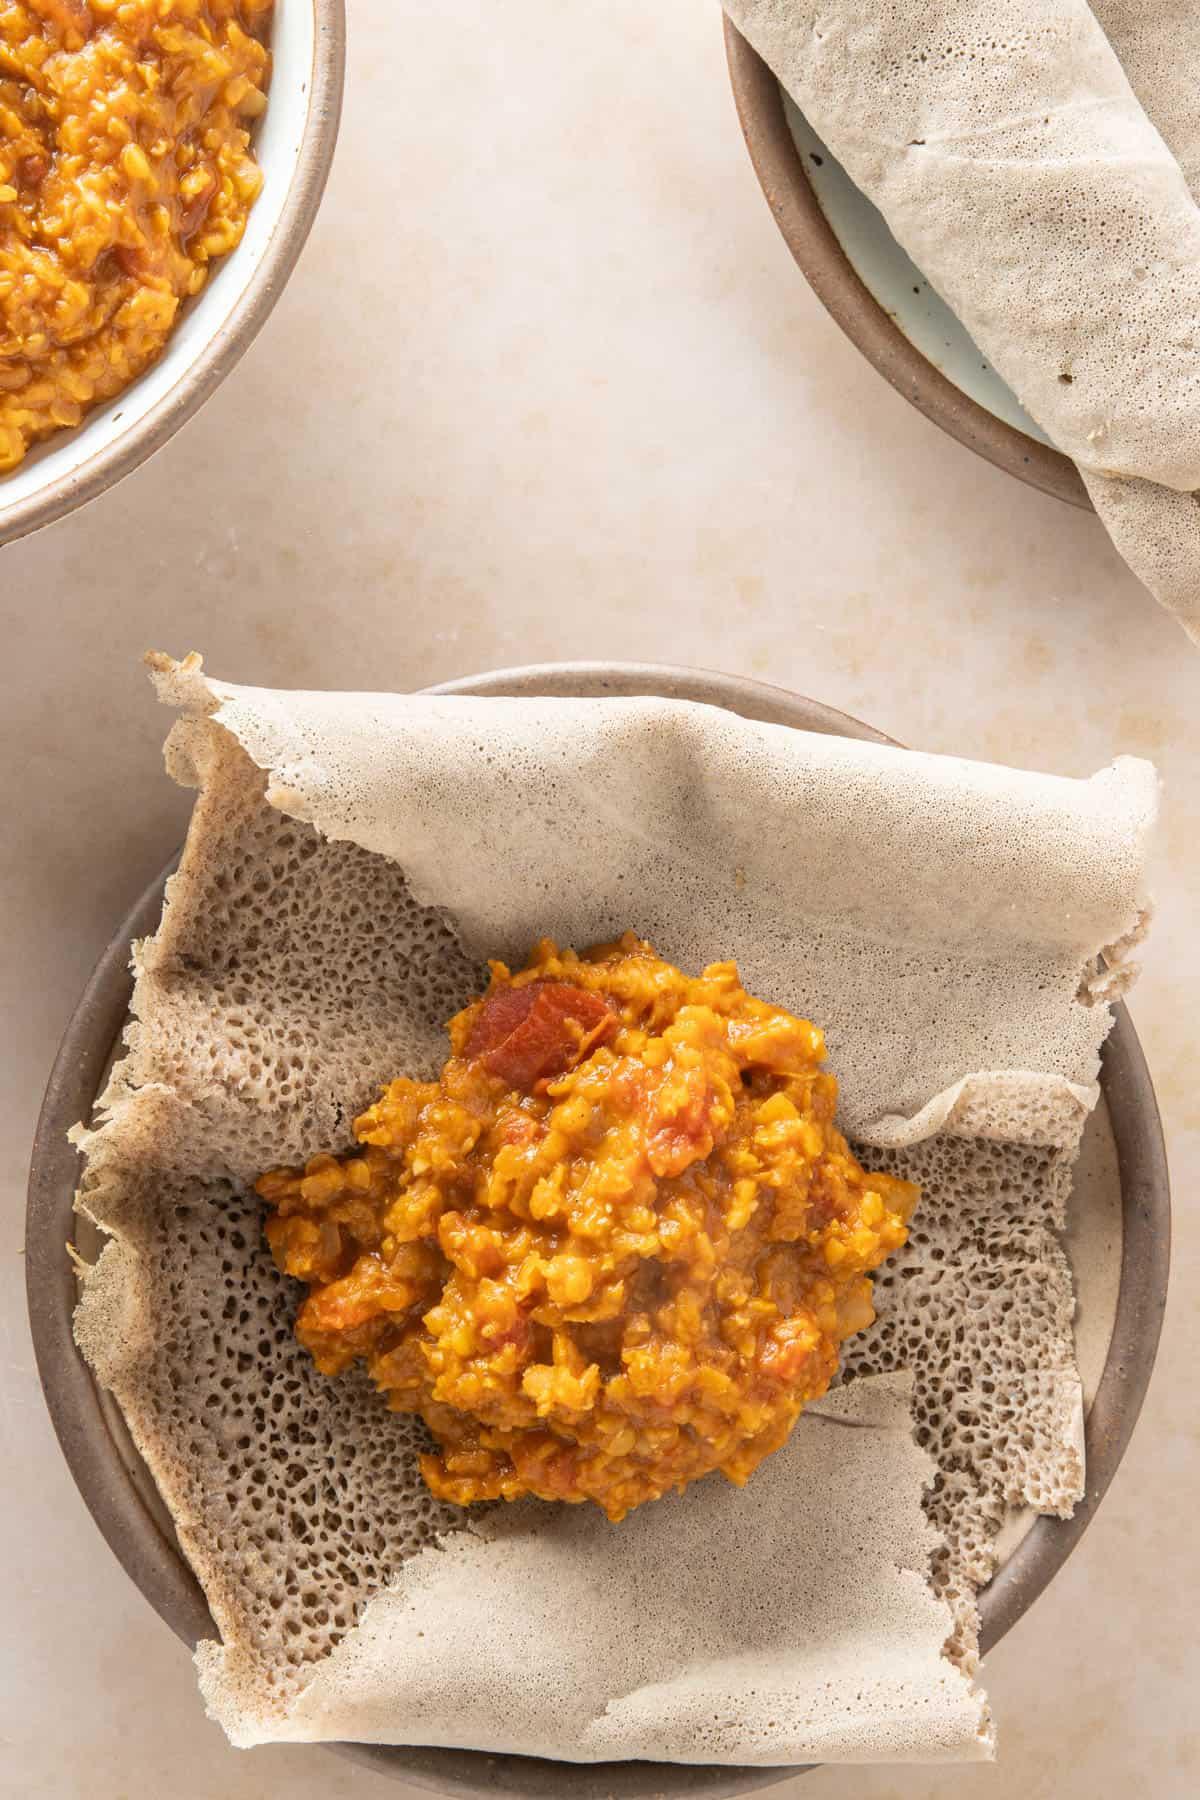 Misir Wot on injera flatbread on a plate